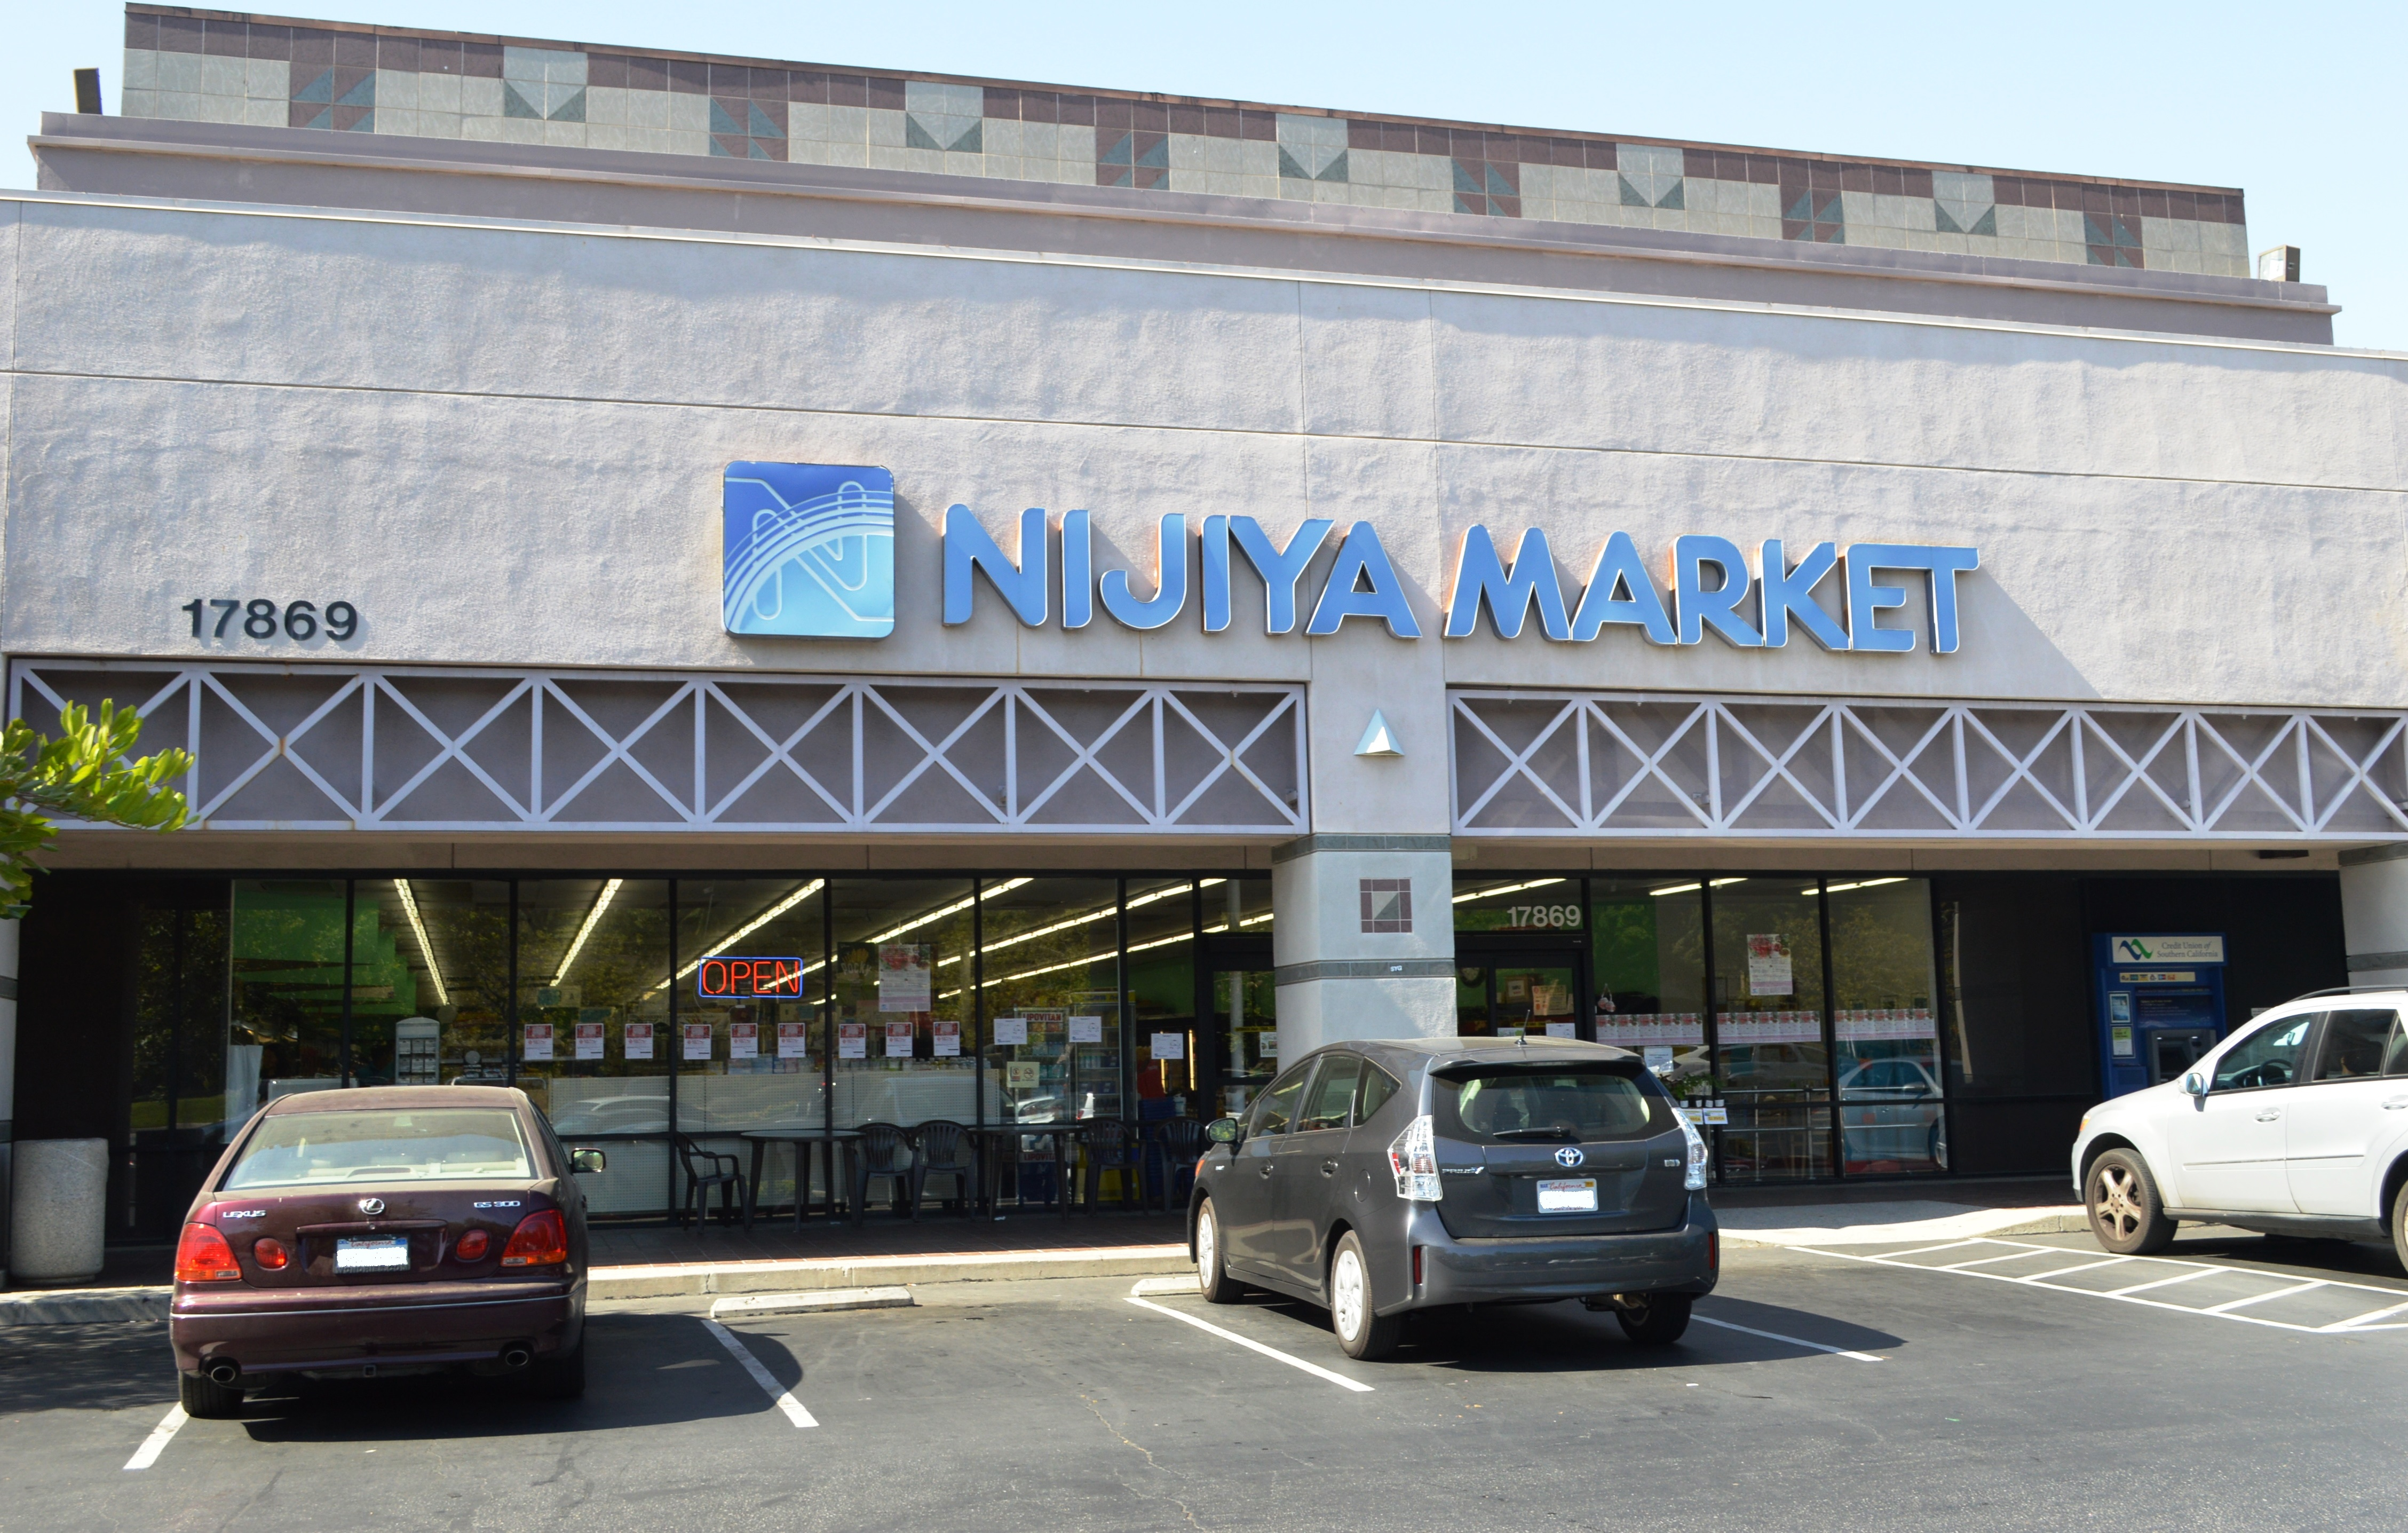 Nijiya Market - Wikipedia